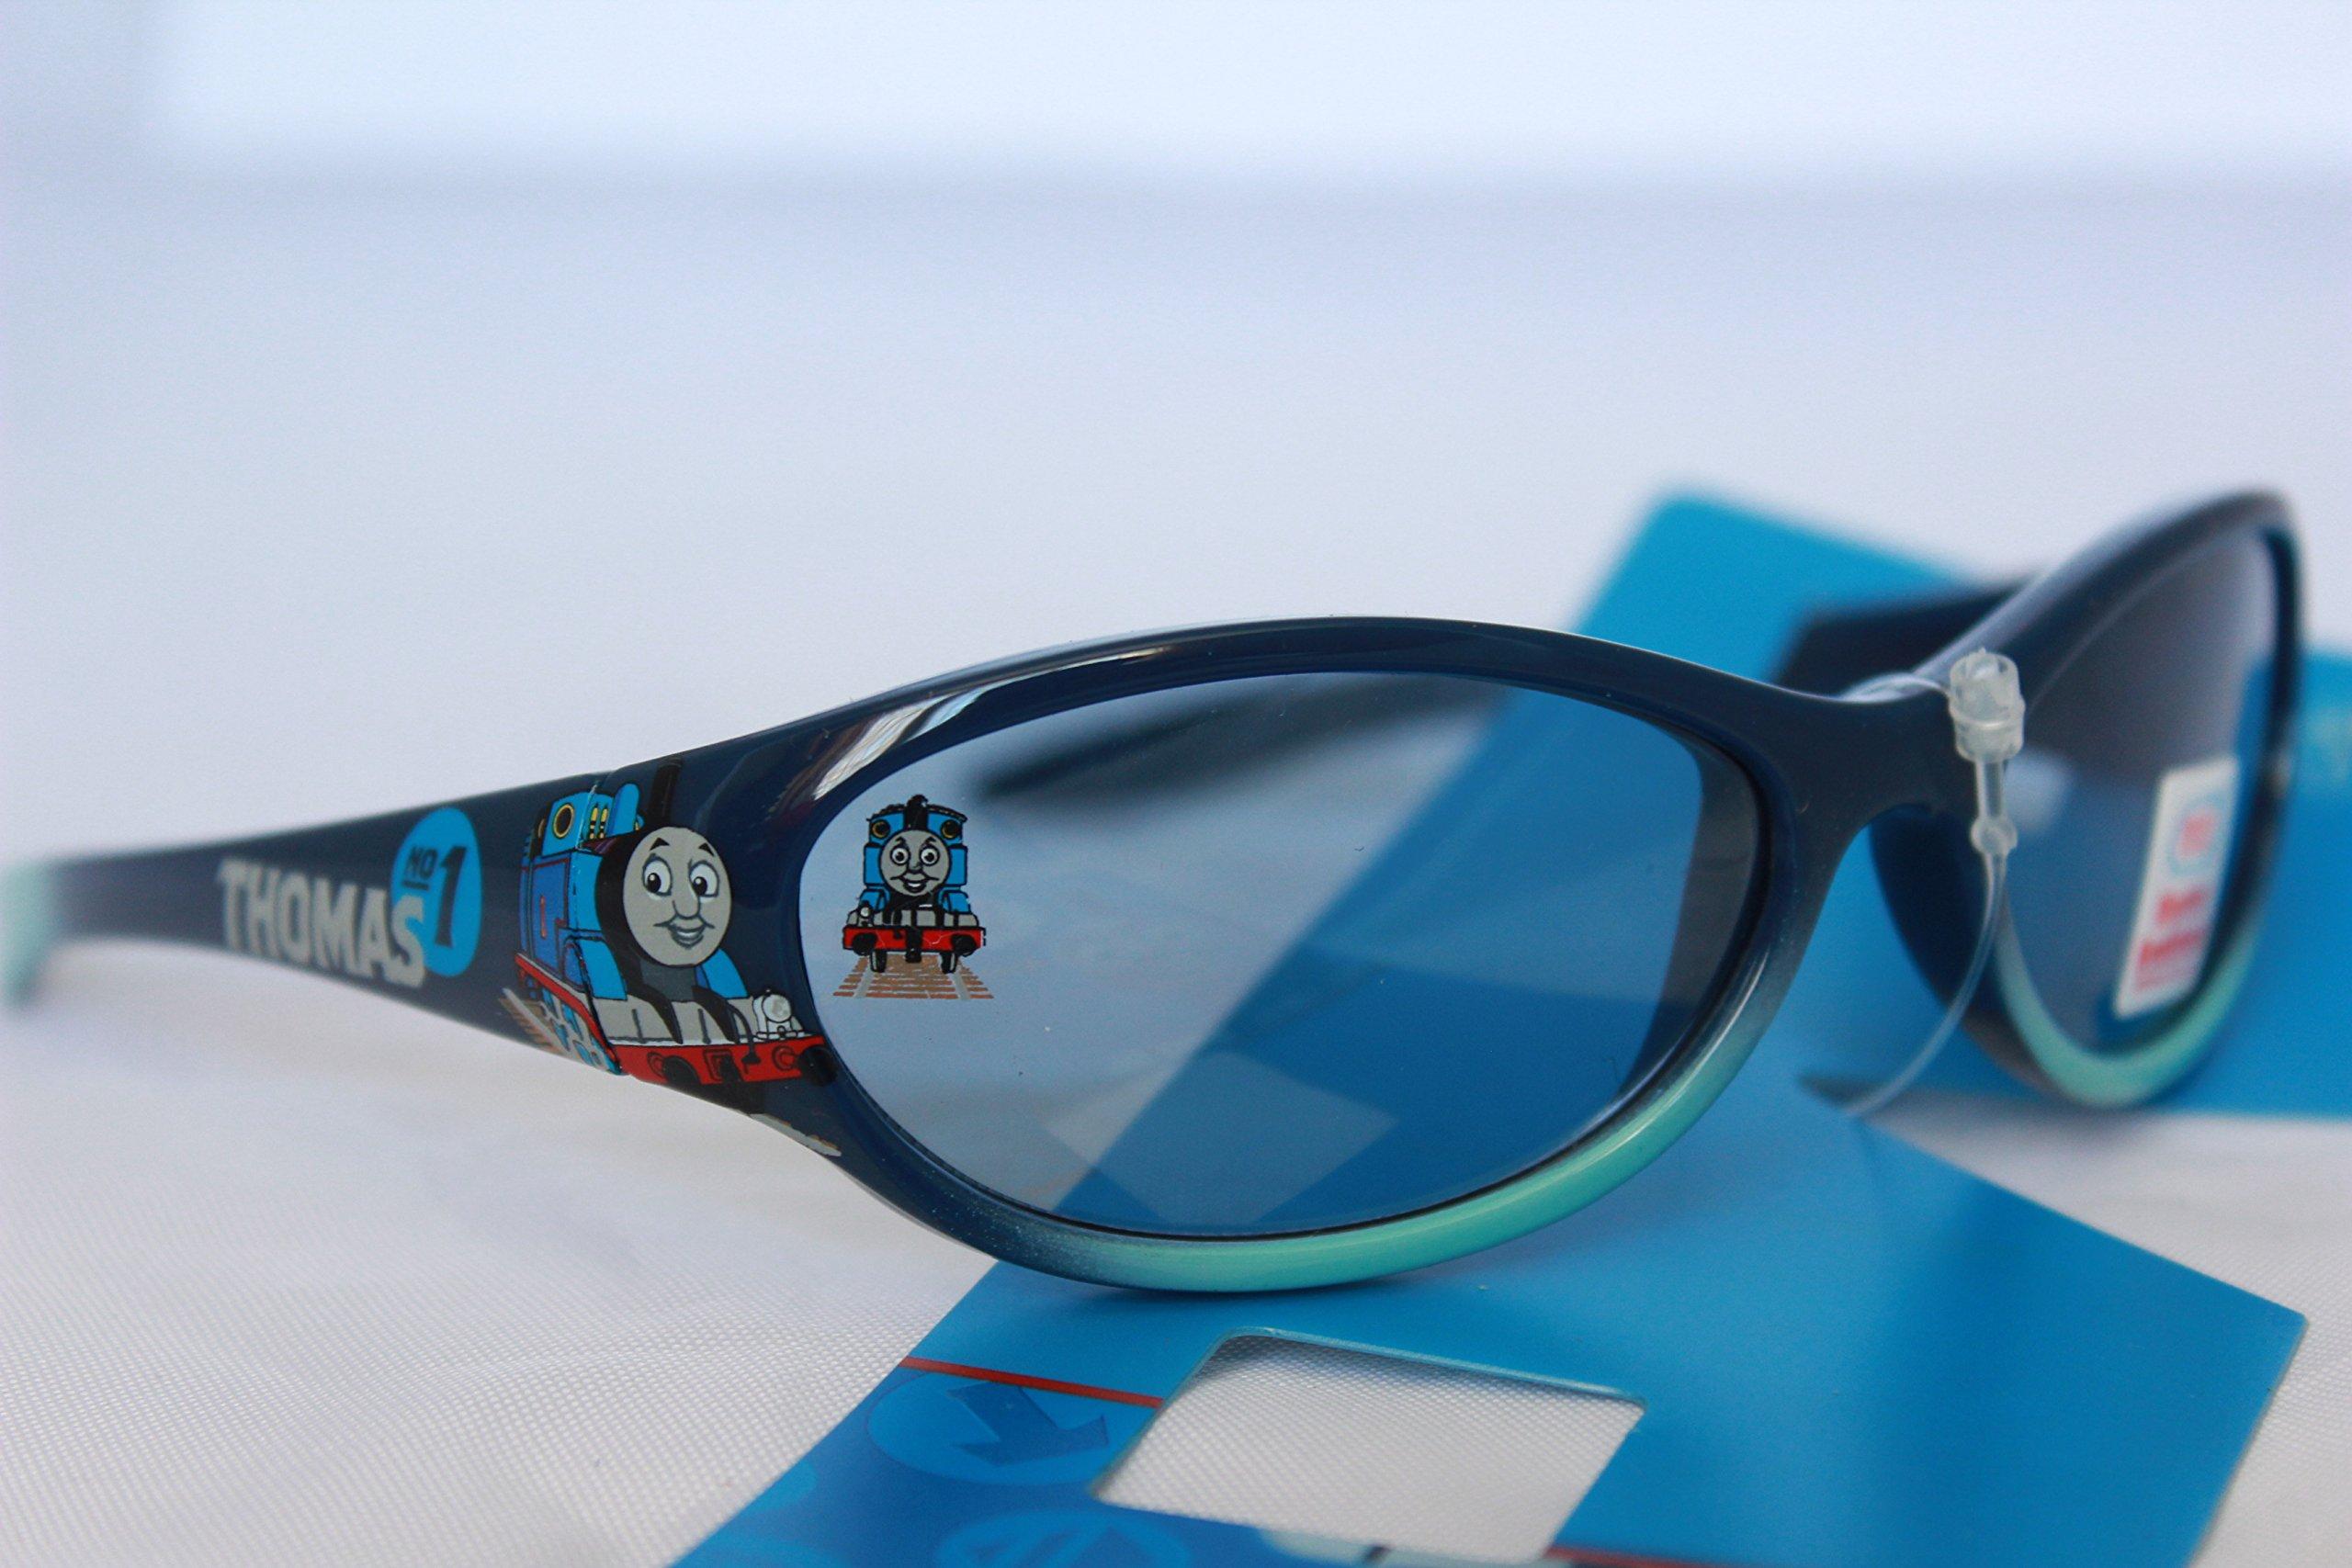 Thomas and Friends Boys Sunglasses 100% UV Protection